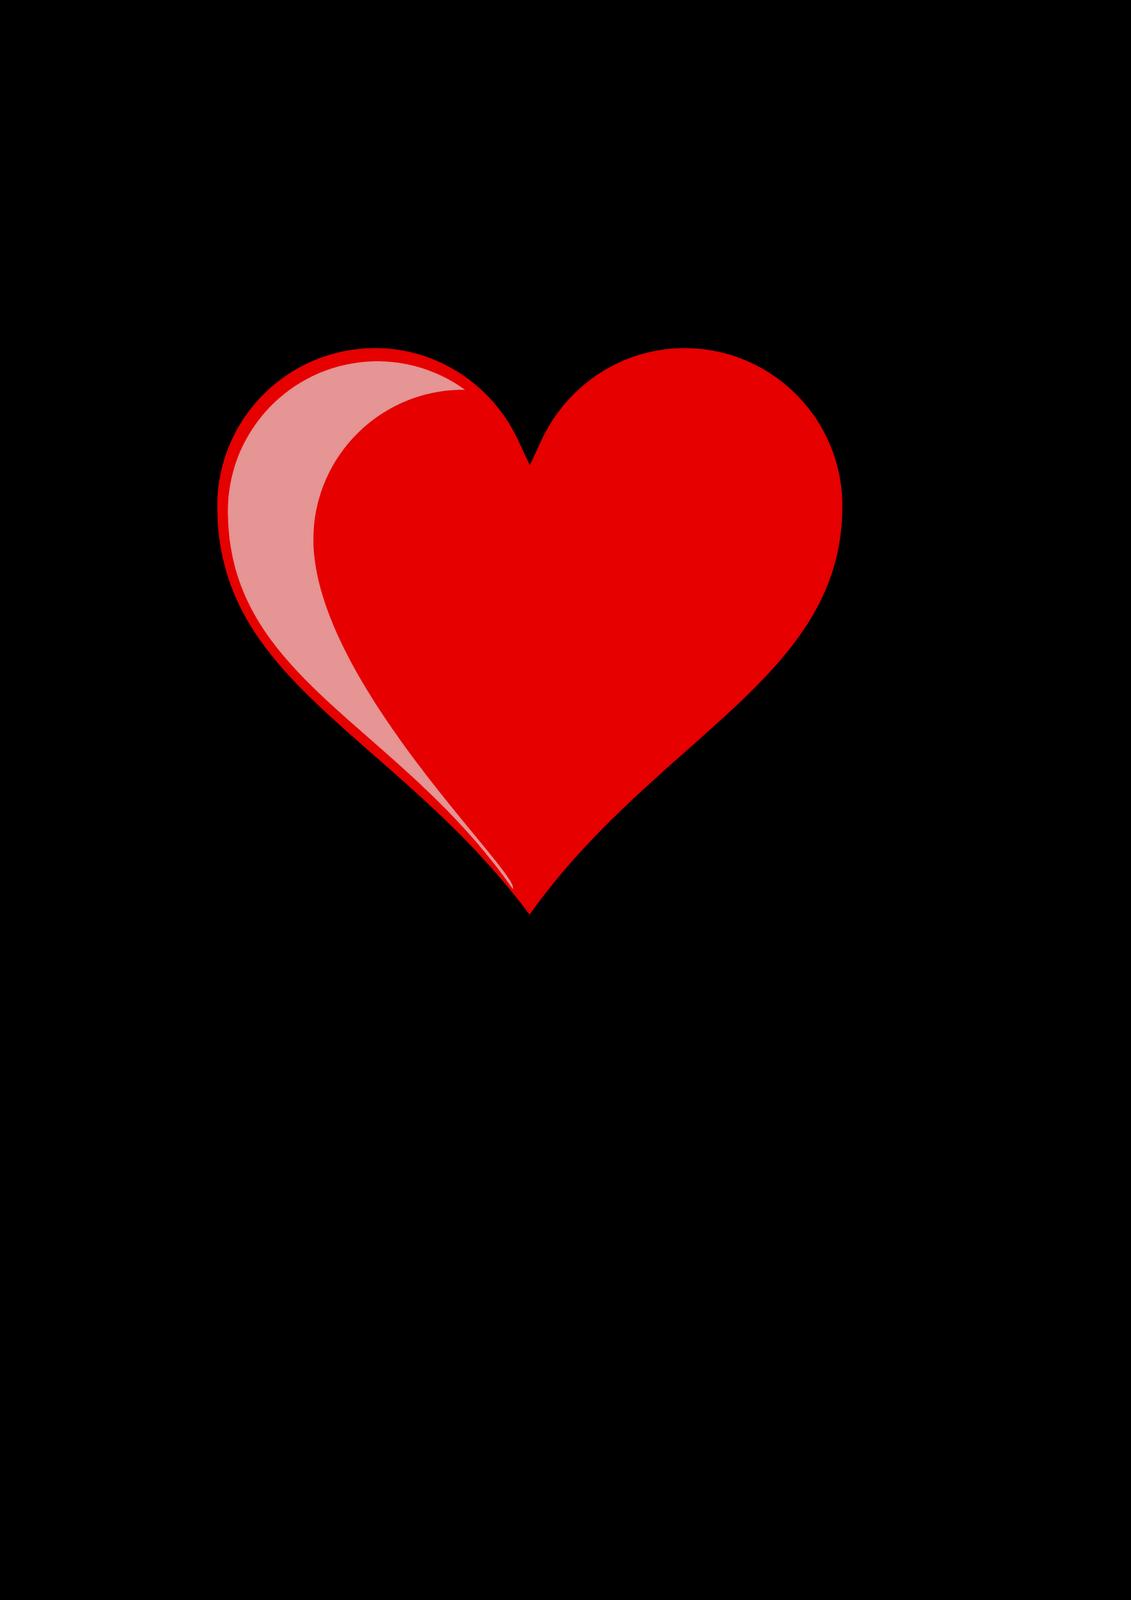 Valentine Day Clip Art Free; Clip Art Va-Valentine Day Clip Art Free; Clip Art Valentines Day ...-16